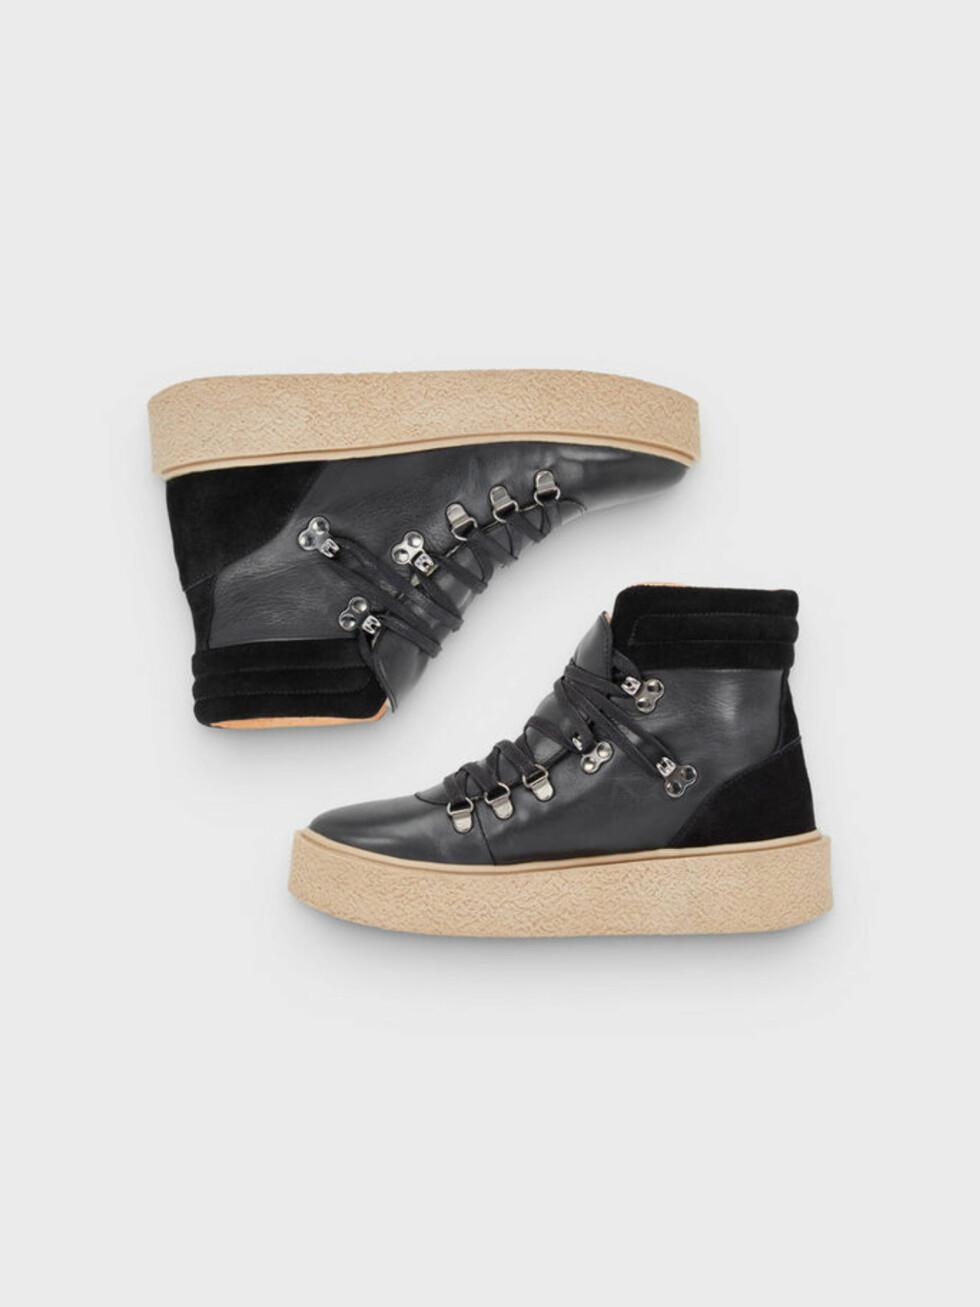 Sko fra Bianco |1399,-| https://www.bianco.com/no/no/bi/one-pair-is-not-enough/one-pair-is-not-enough/platform-warm-hiker-boots-93349482.html?cgid=bi-aw17-campaign-product&dwvar_colorPattern=93349482_Black